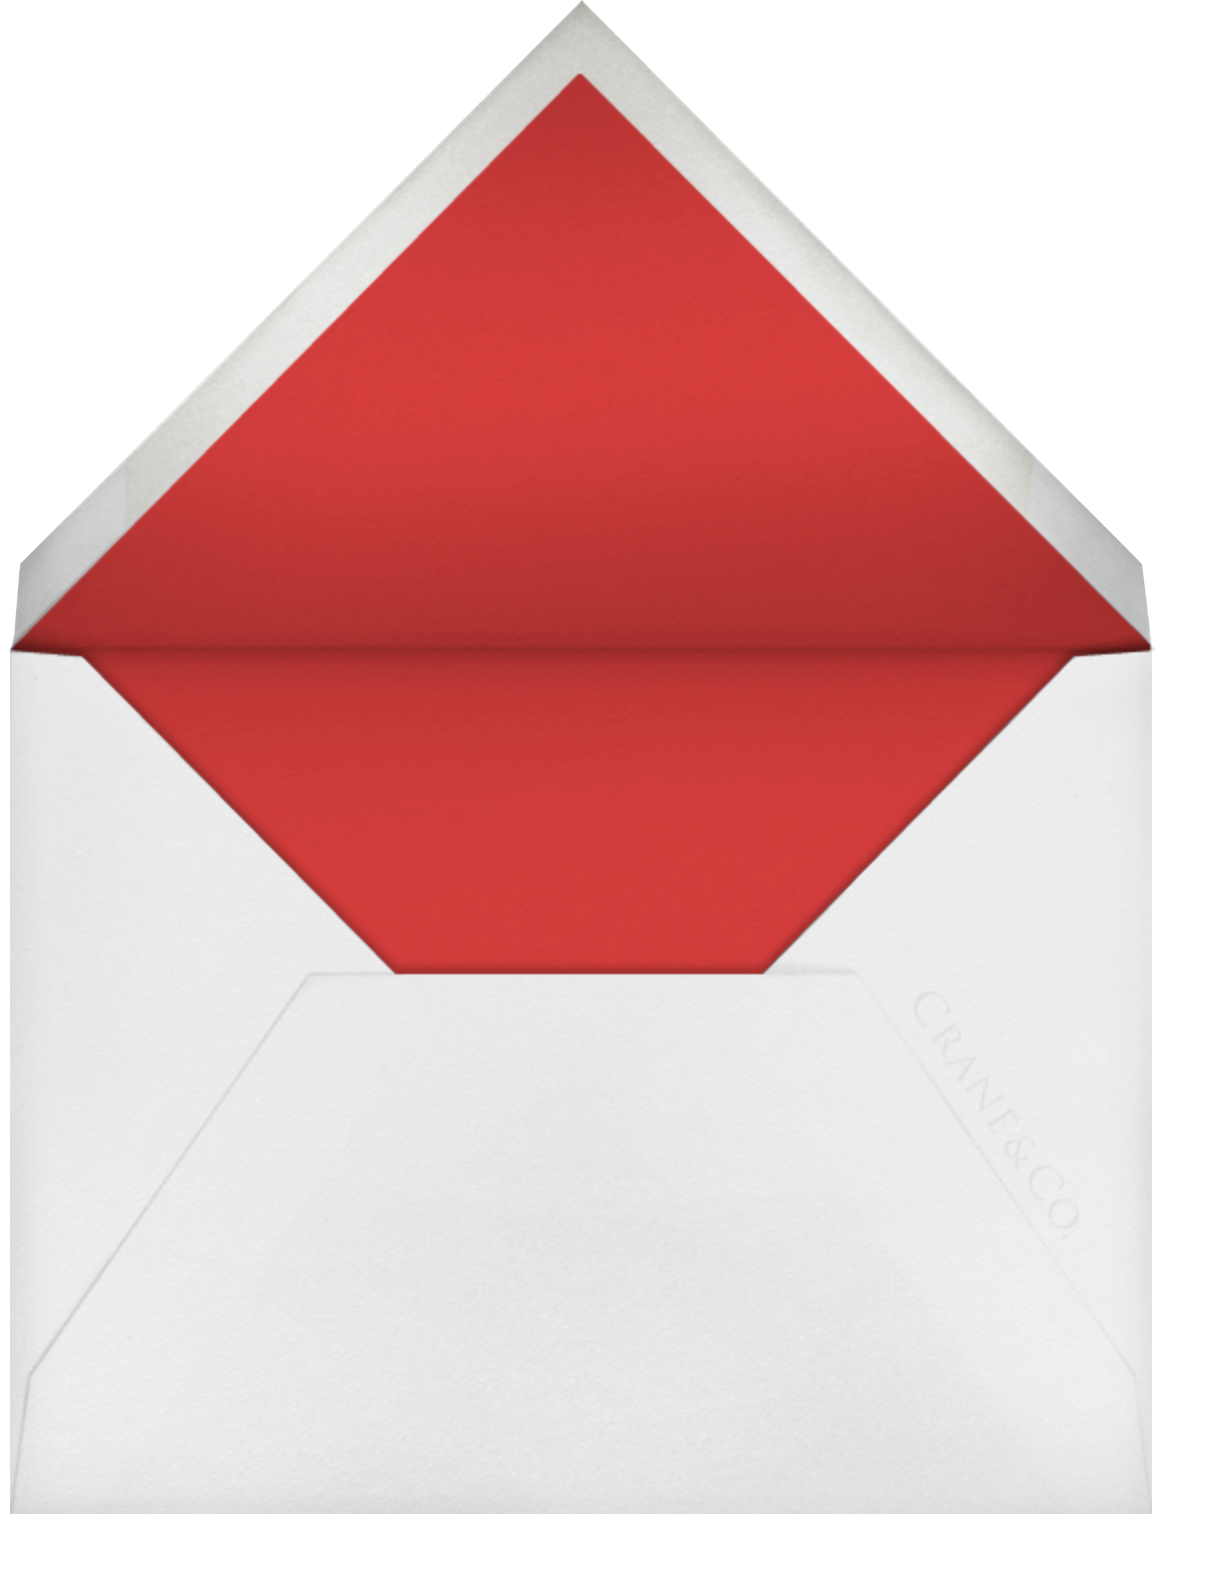 Alcazar (Thank You) - Black - Crane & Co. - Personalized stationery - envelope back